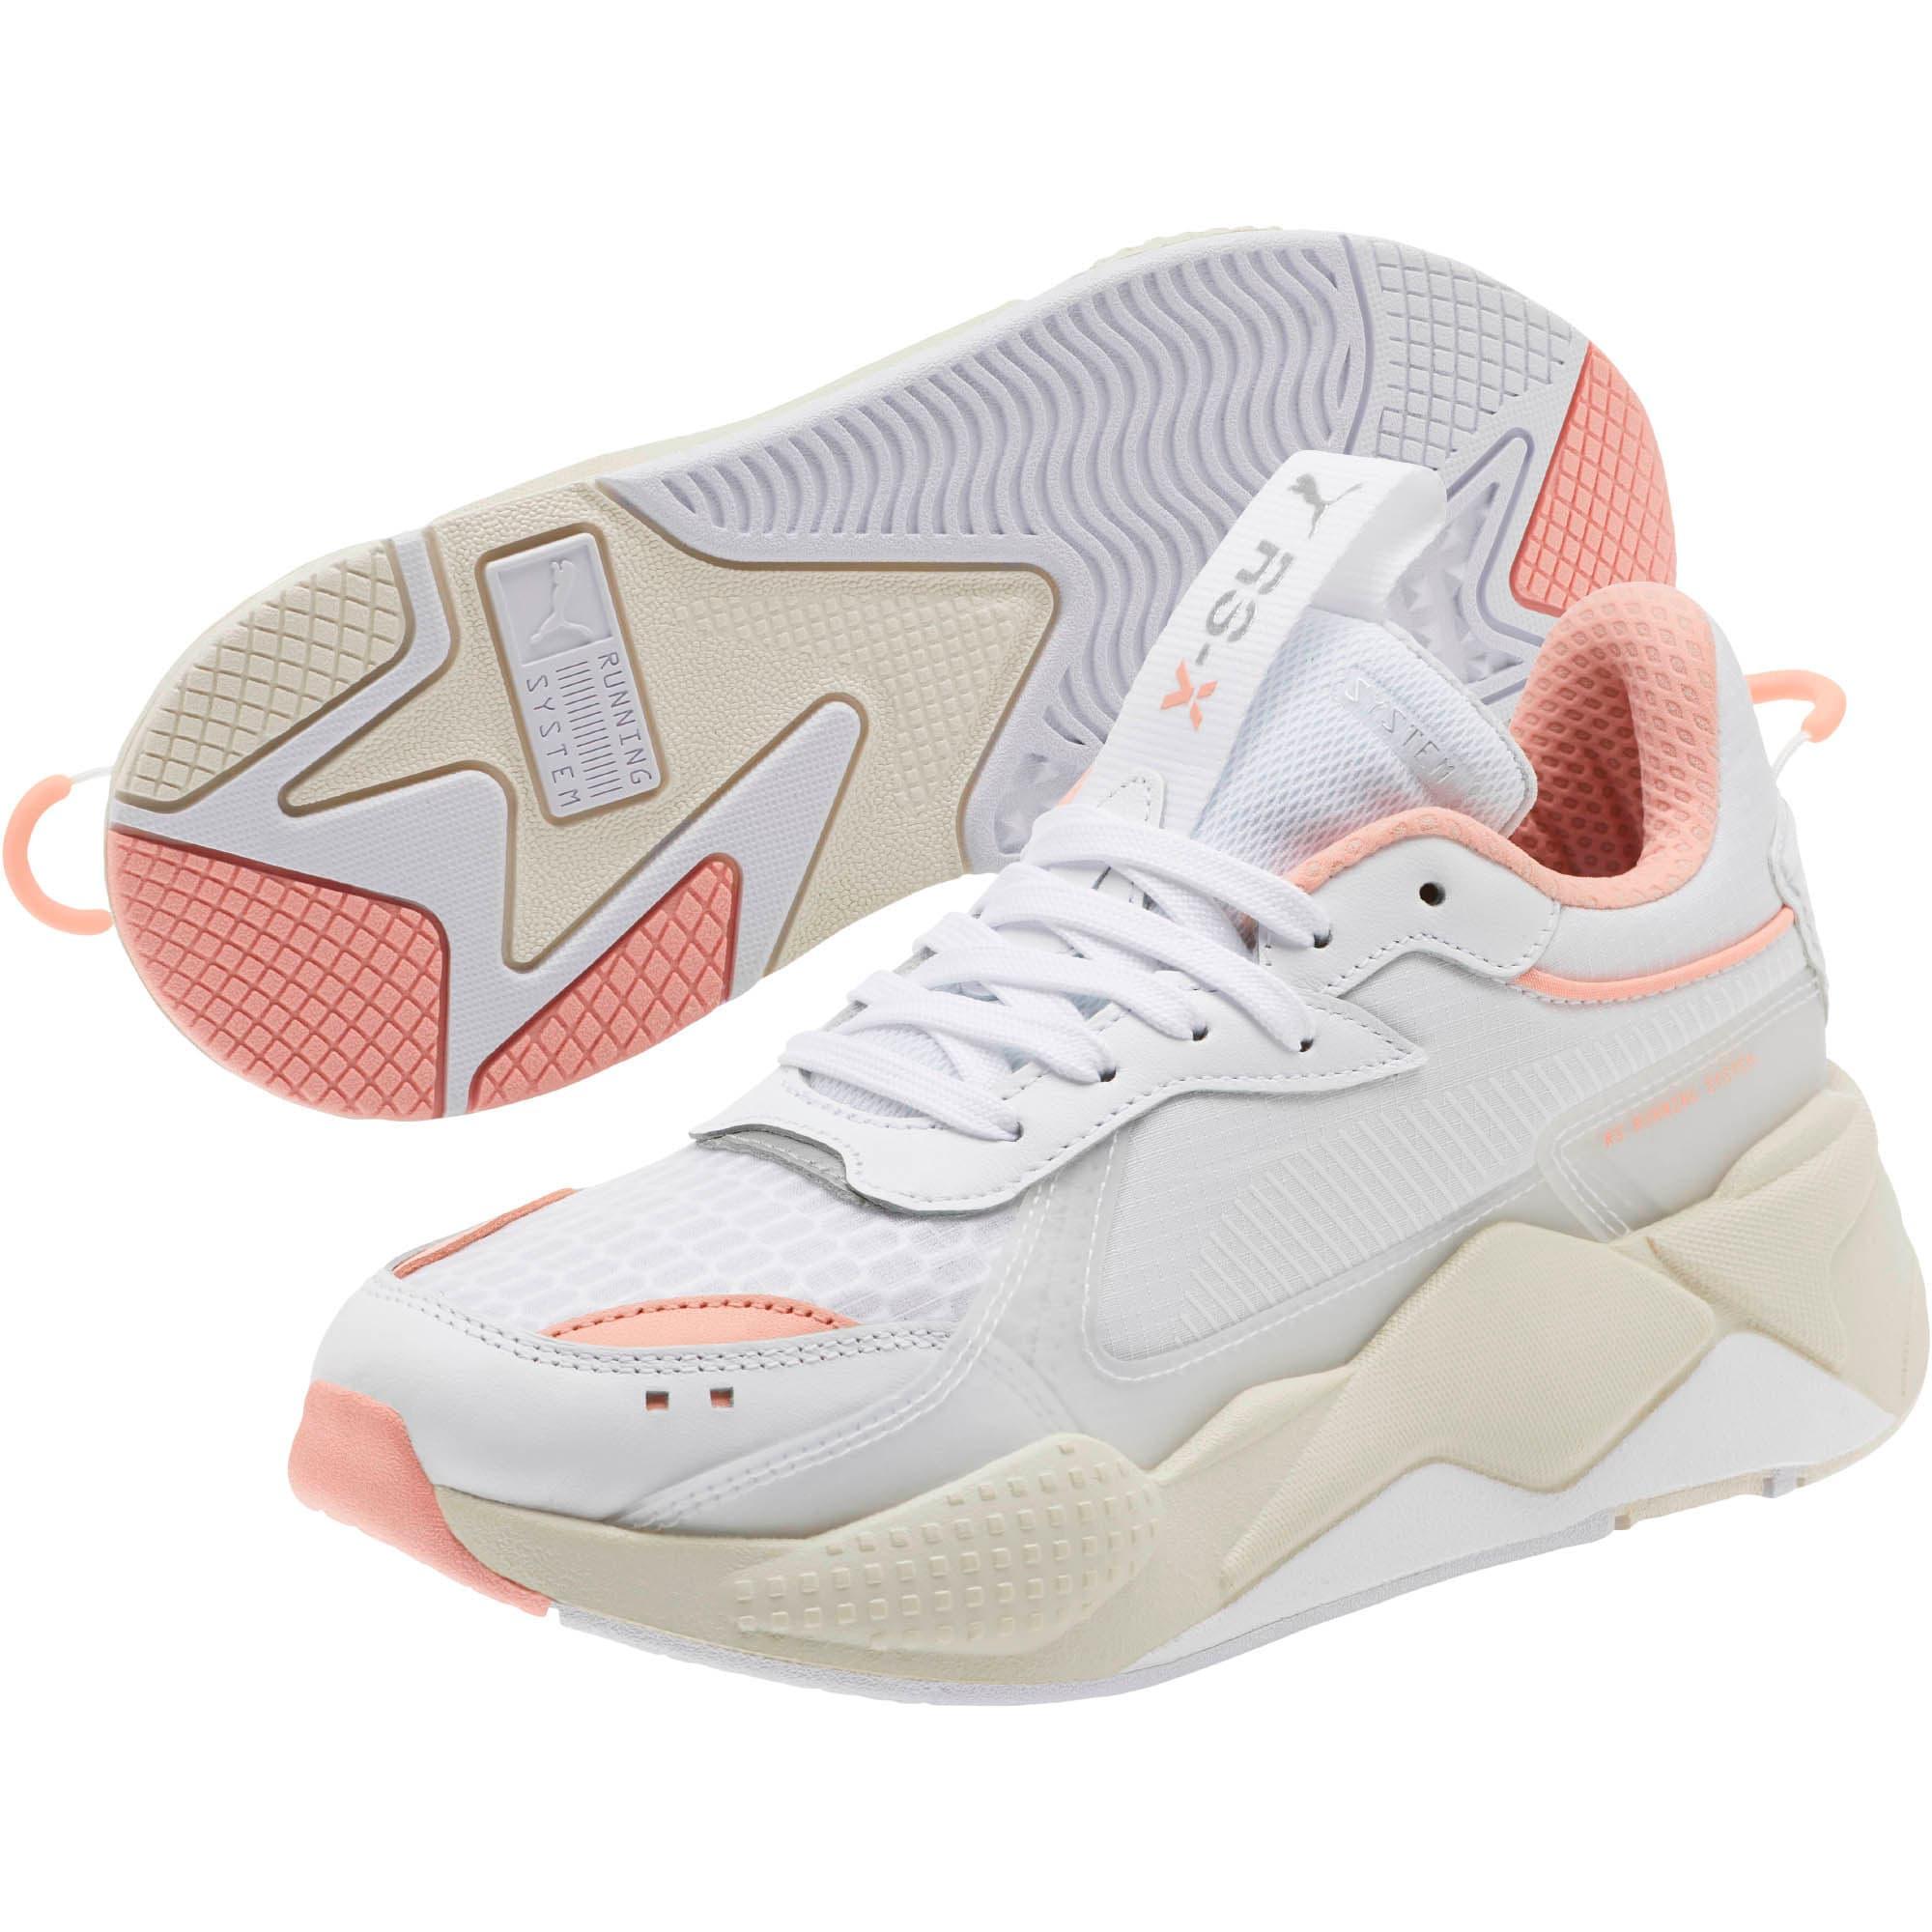 Thumbnail 2 of RS-X Tech Women's Sneakers, Puma White-Peach Bud, medium